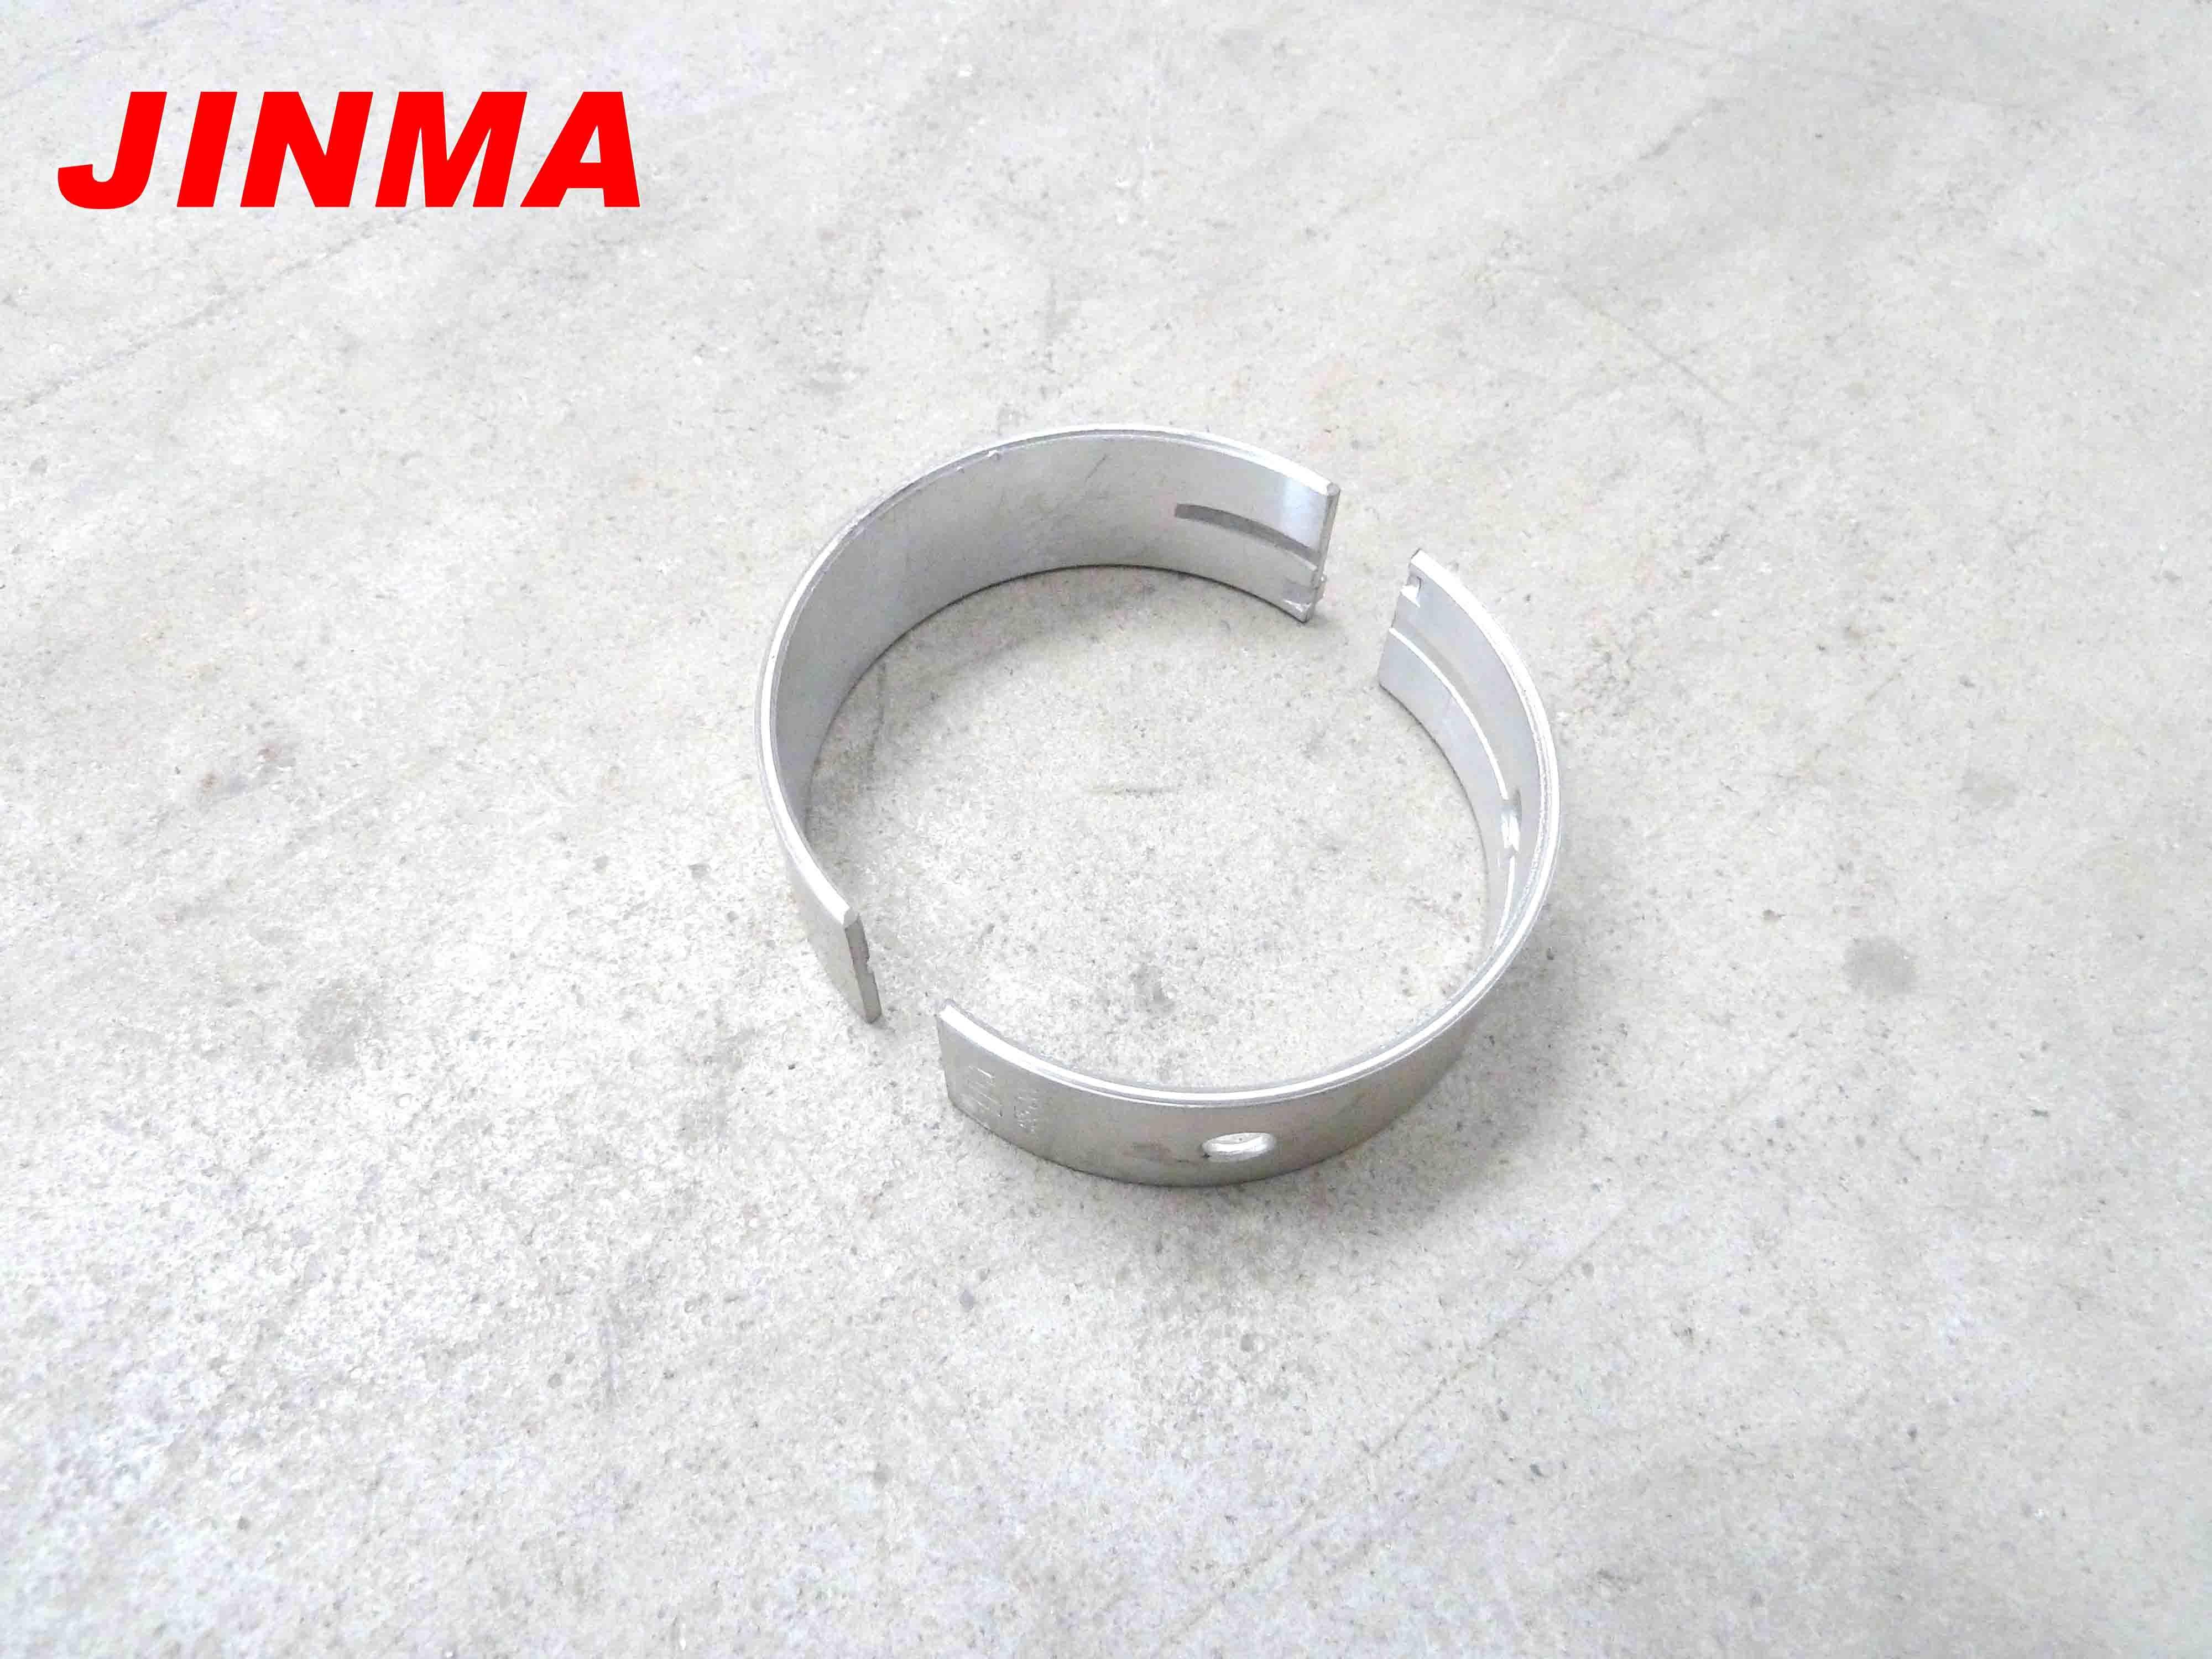 Jinma Tractor Parts